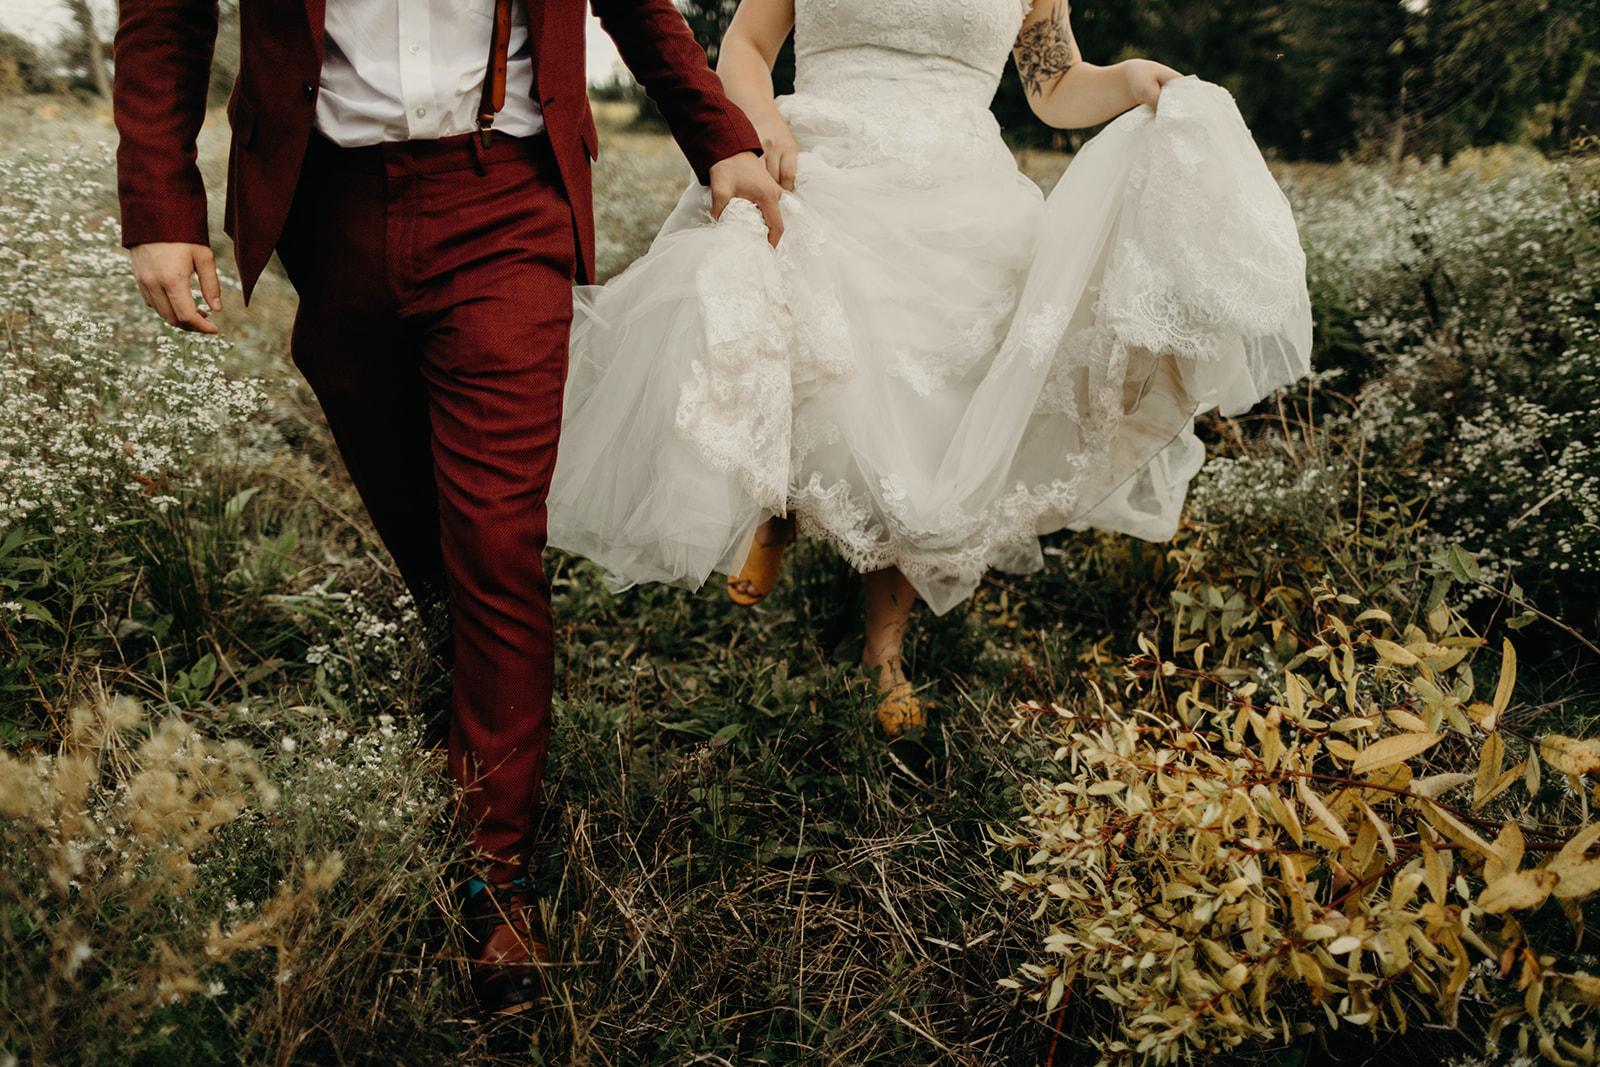 Bride and groom fashion inspiration